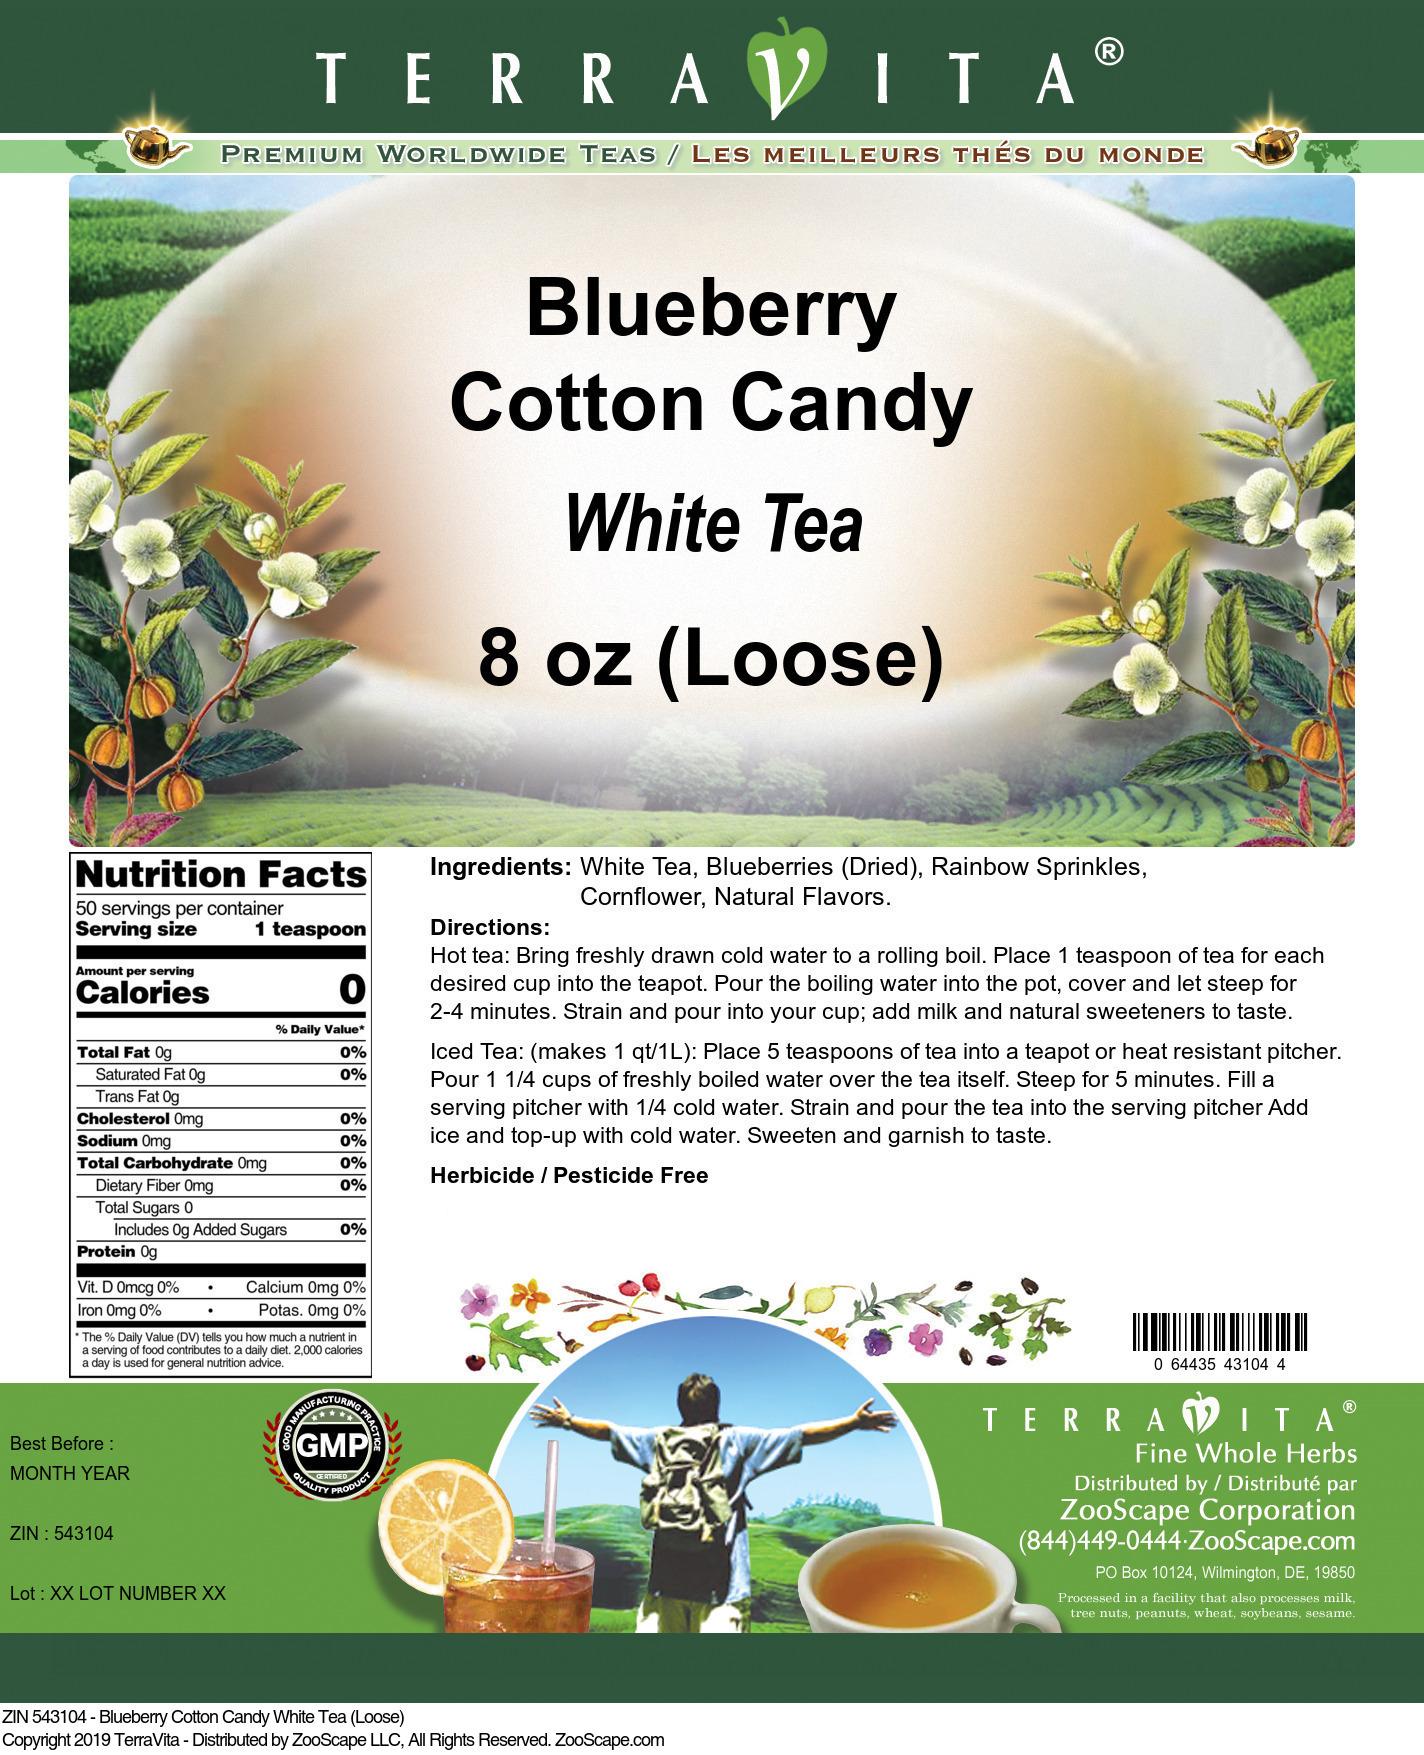 Blueberry Cotton Candy White Tea (Loose)